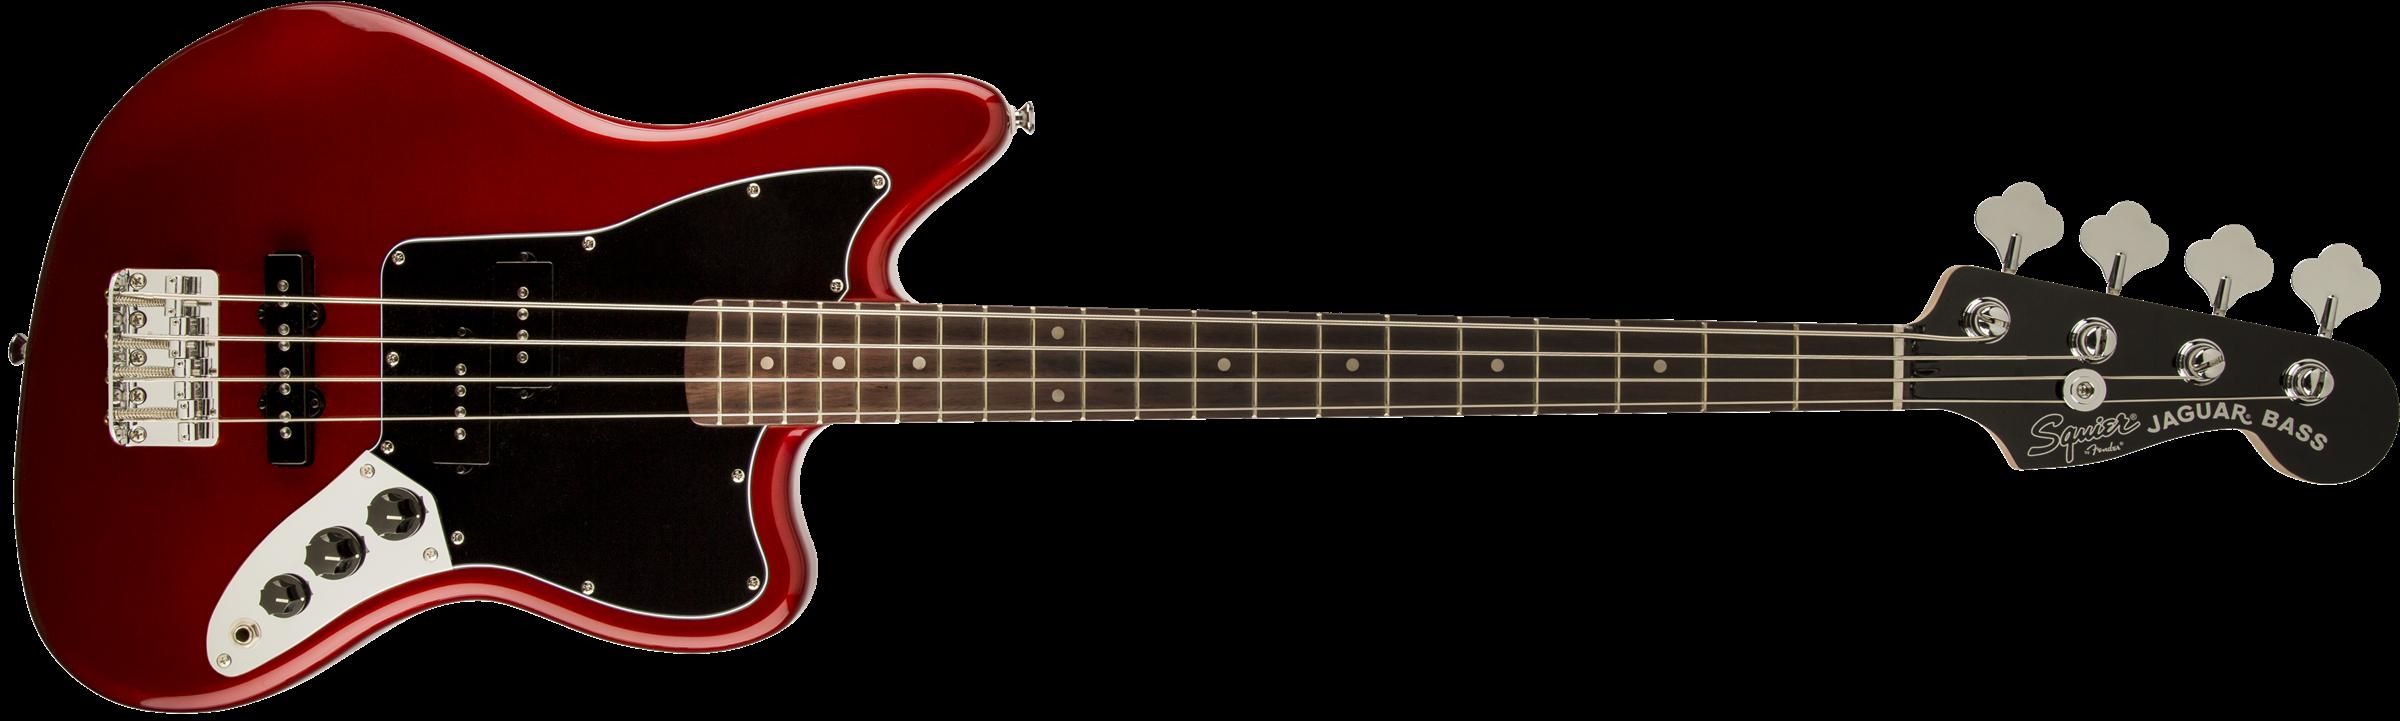 SQUIER Vintage Modified Jaguar Bass Special SS, Laurel Fingerboard, Candy Apple Red